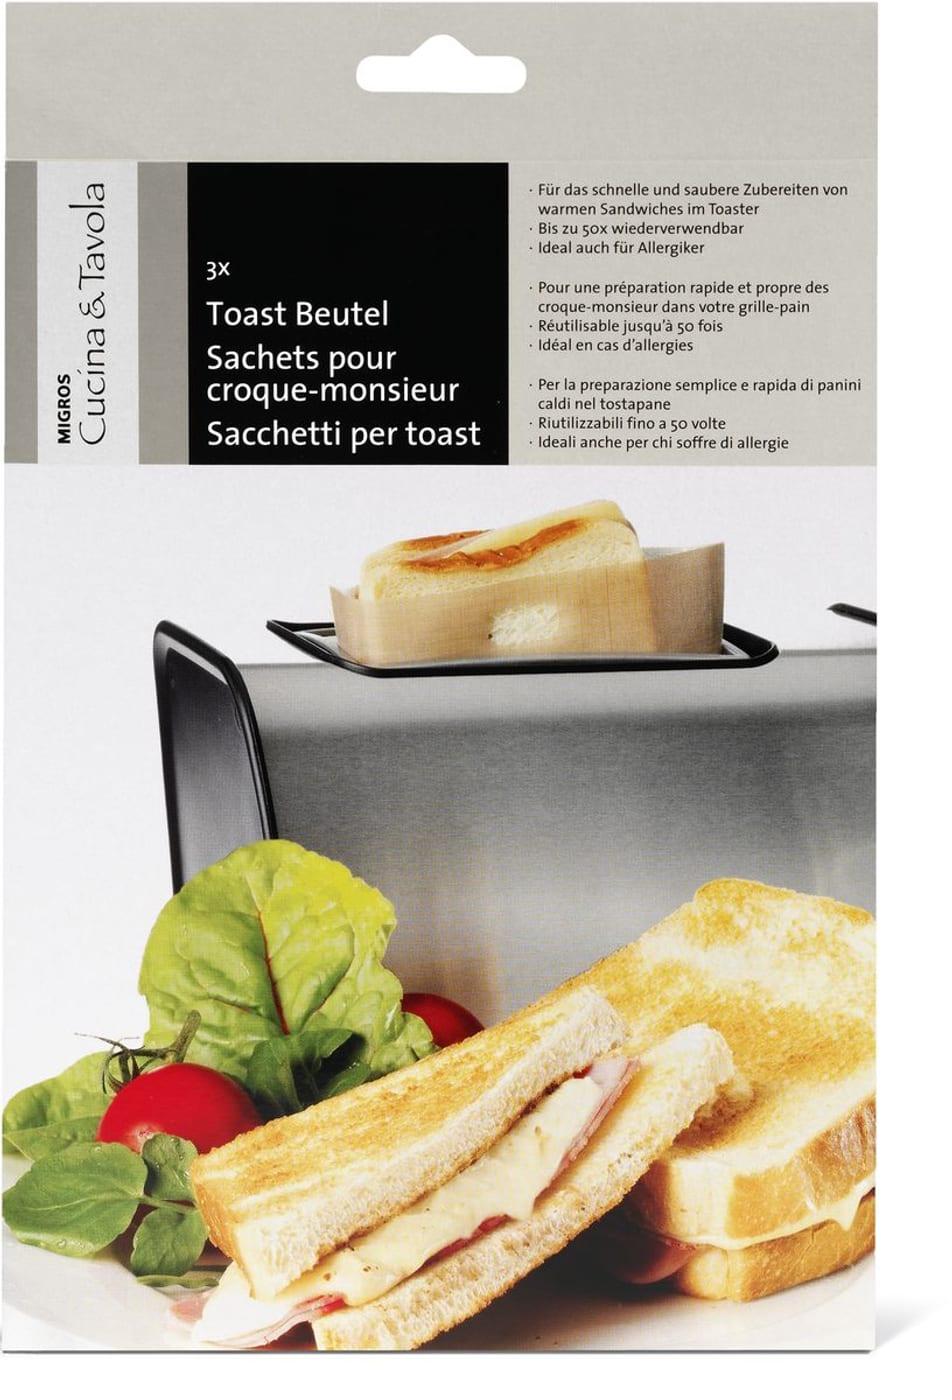 Cucina tavola cucina tavola sachets pour croque for Tavola cucina